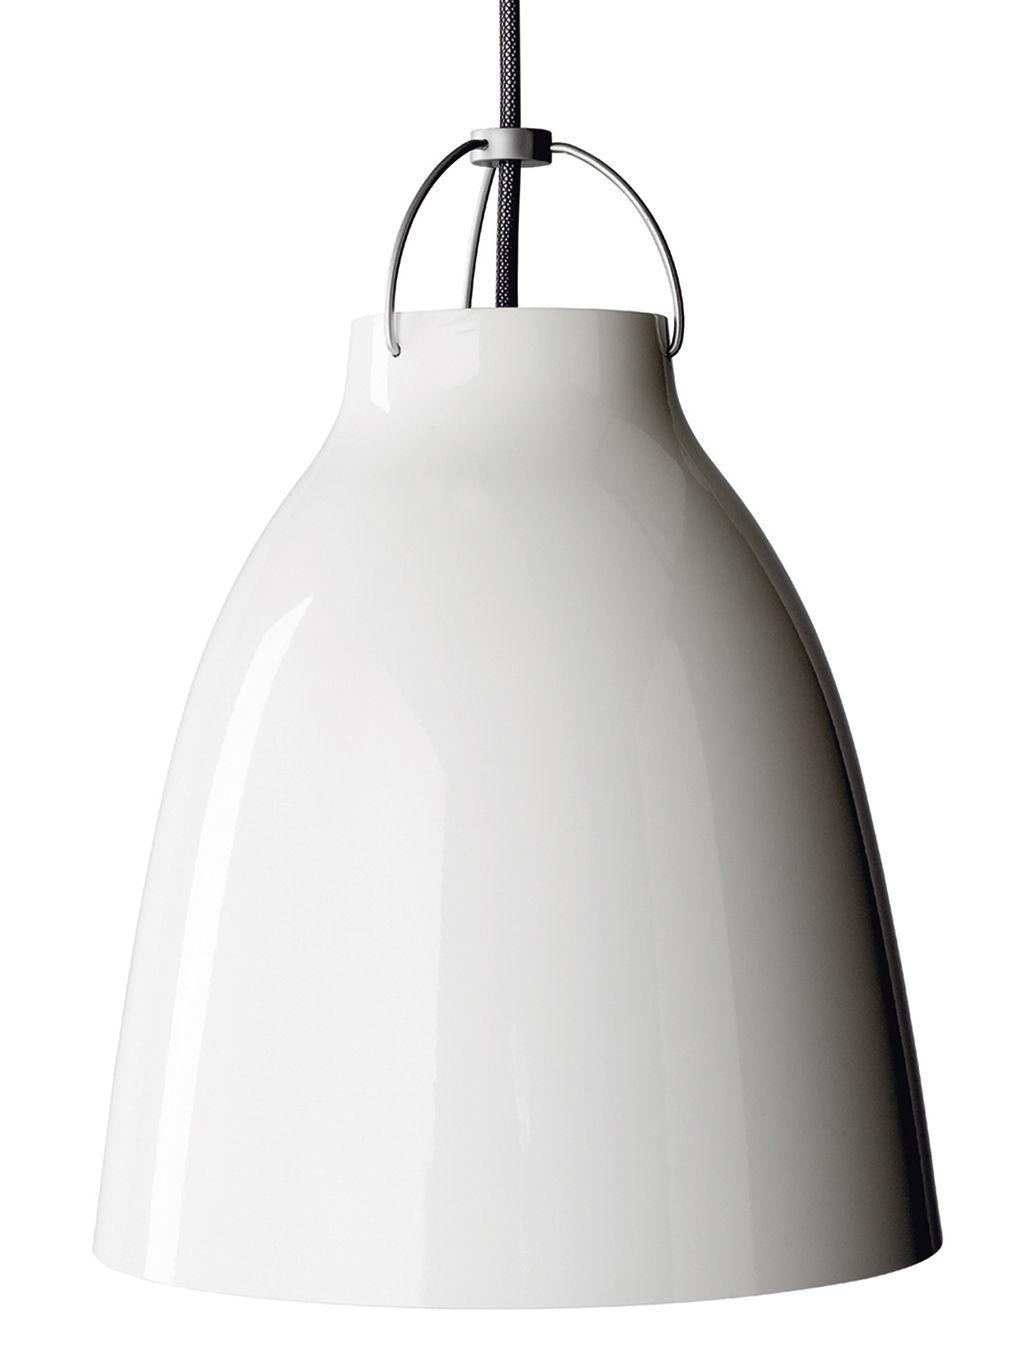 Lighting - Pendant Lighting - Caravaggio Medium Pendant by Lightyears - White - Ø 25,7 cm - Lacquered aluminium